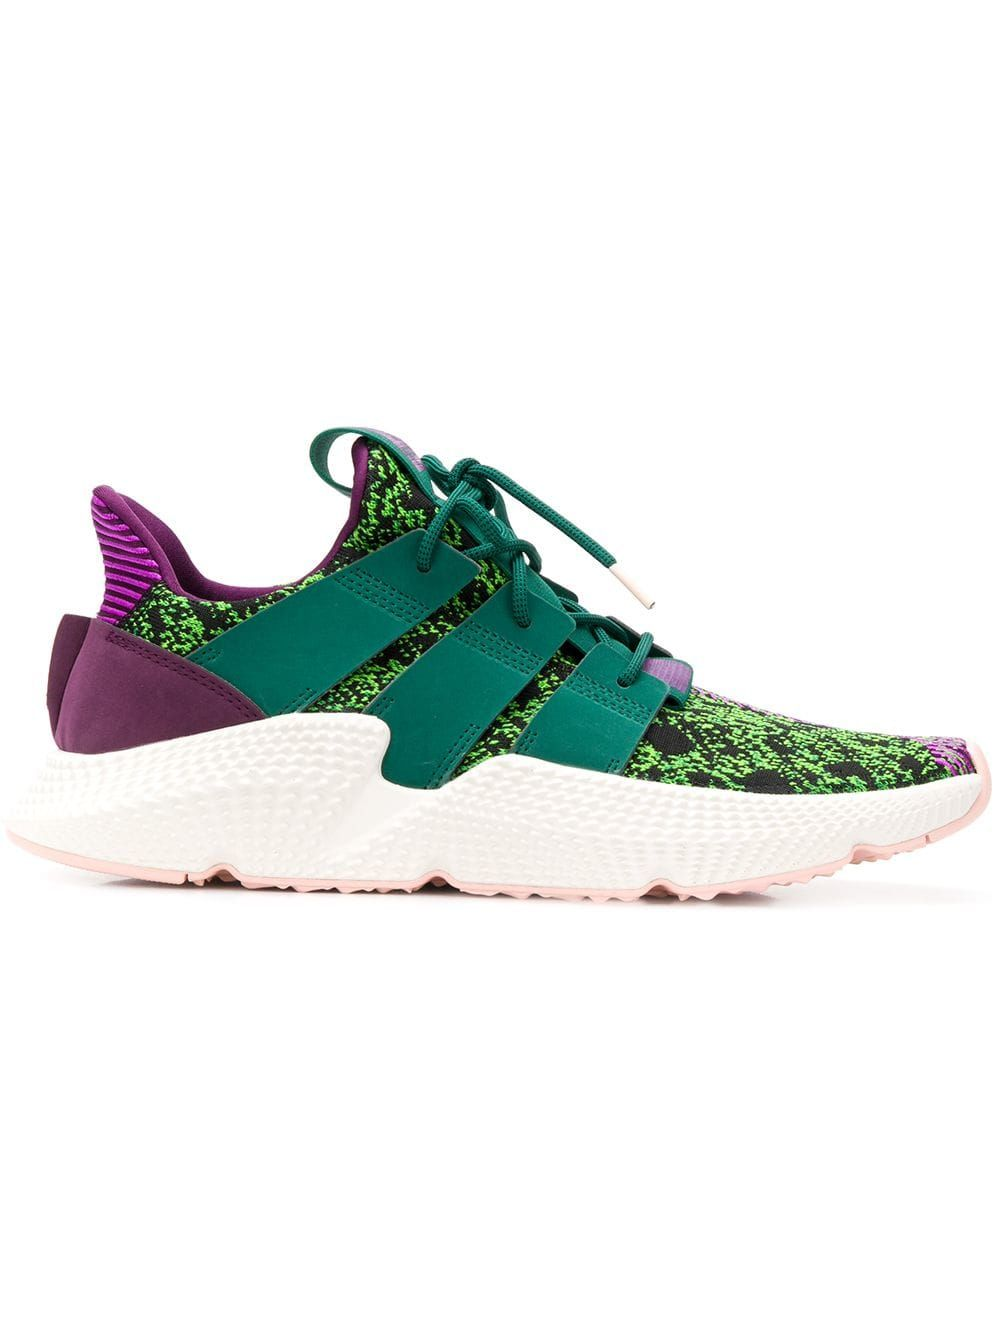 "save off 5d04b 67b9c ADIDAS ORIGINALS ADIDAS DRAGON BALL Z X ADIDAS PROPHERE ""CELL"" SNEAKERS -  GREEN.  adidasoriginals  shoes"